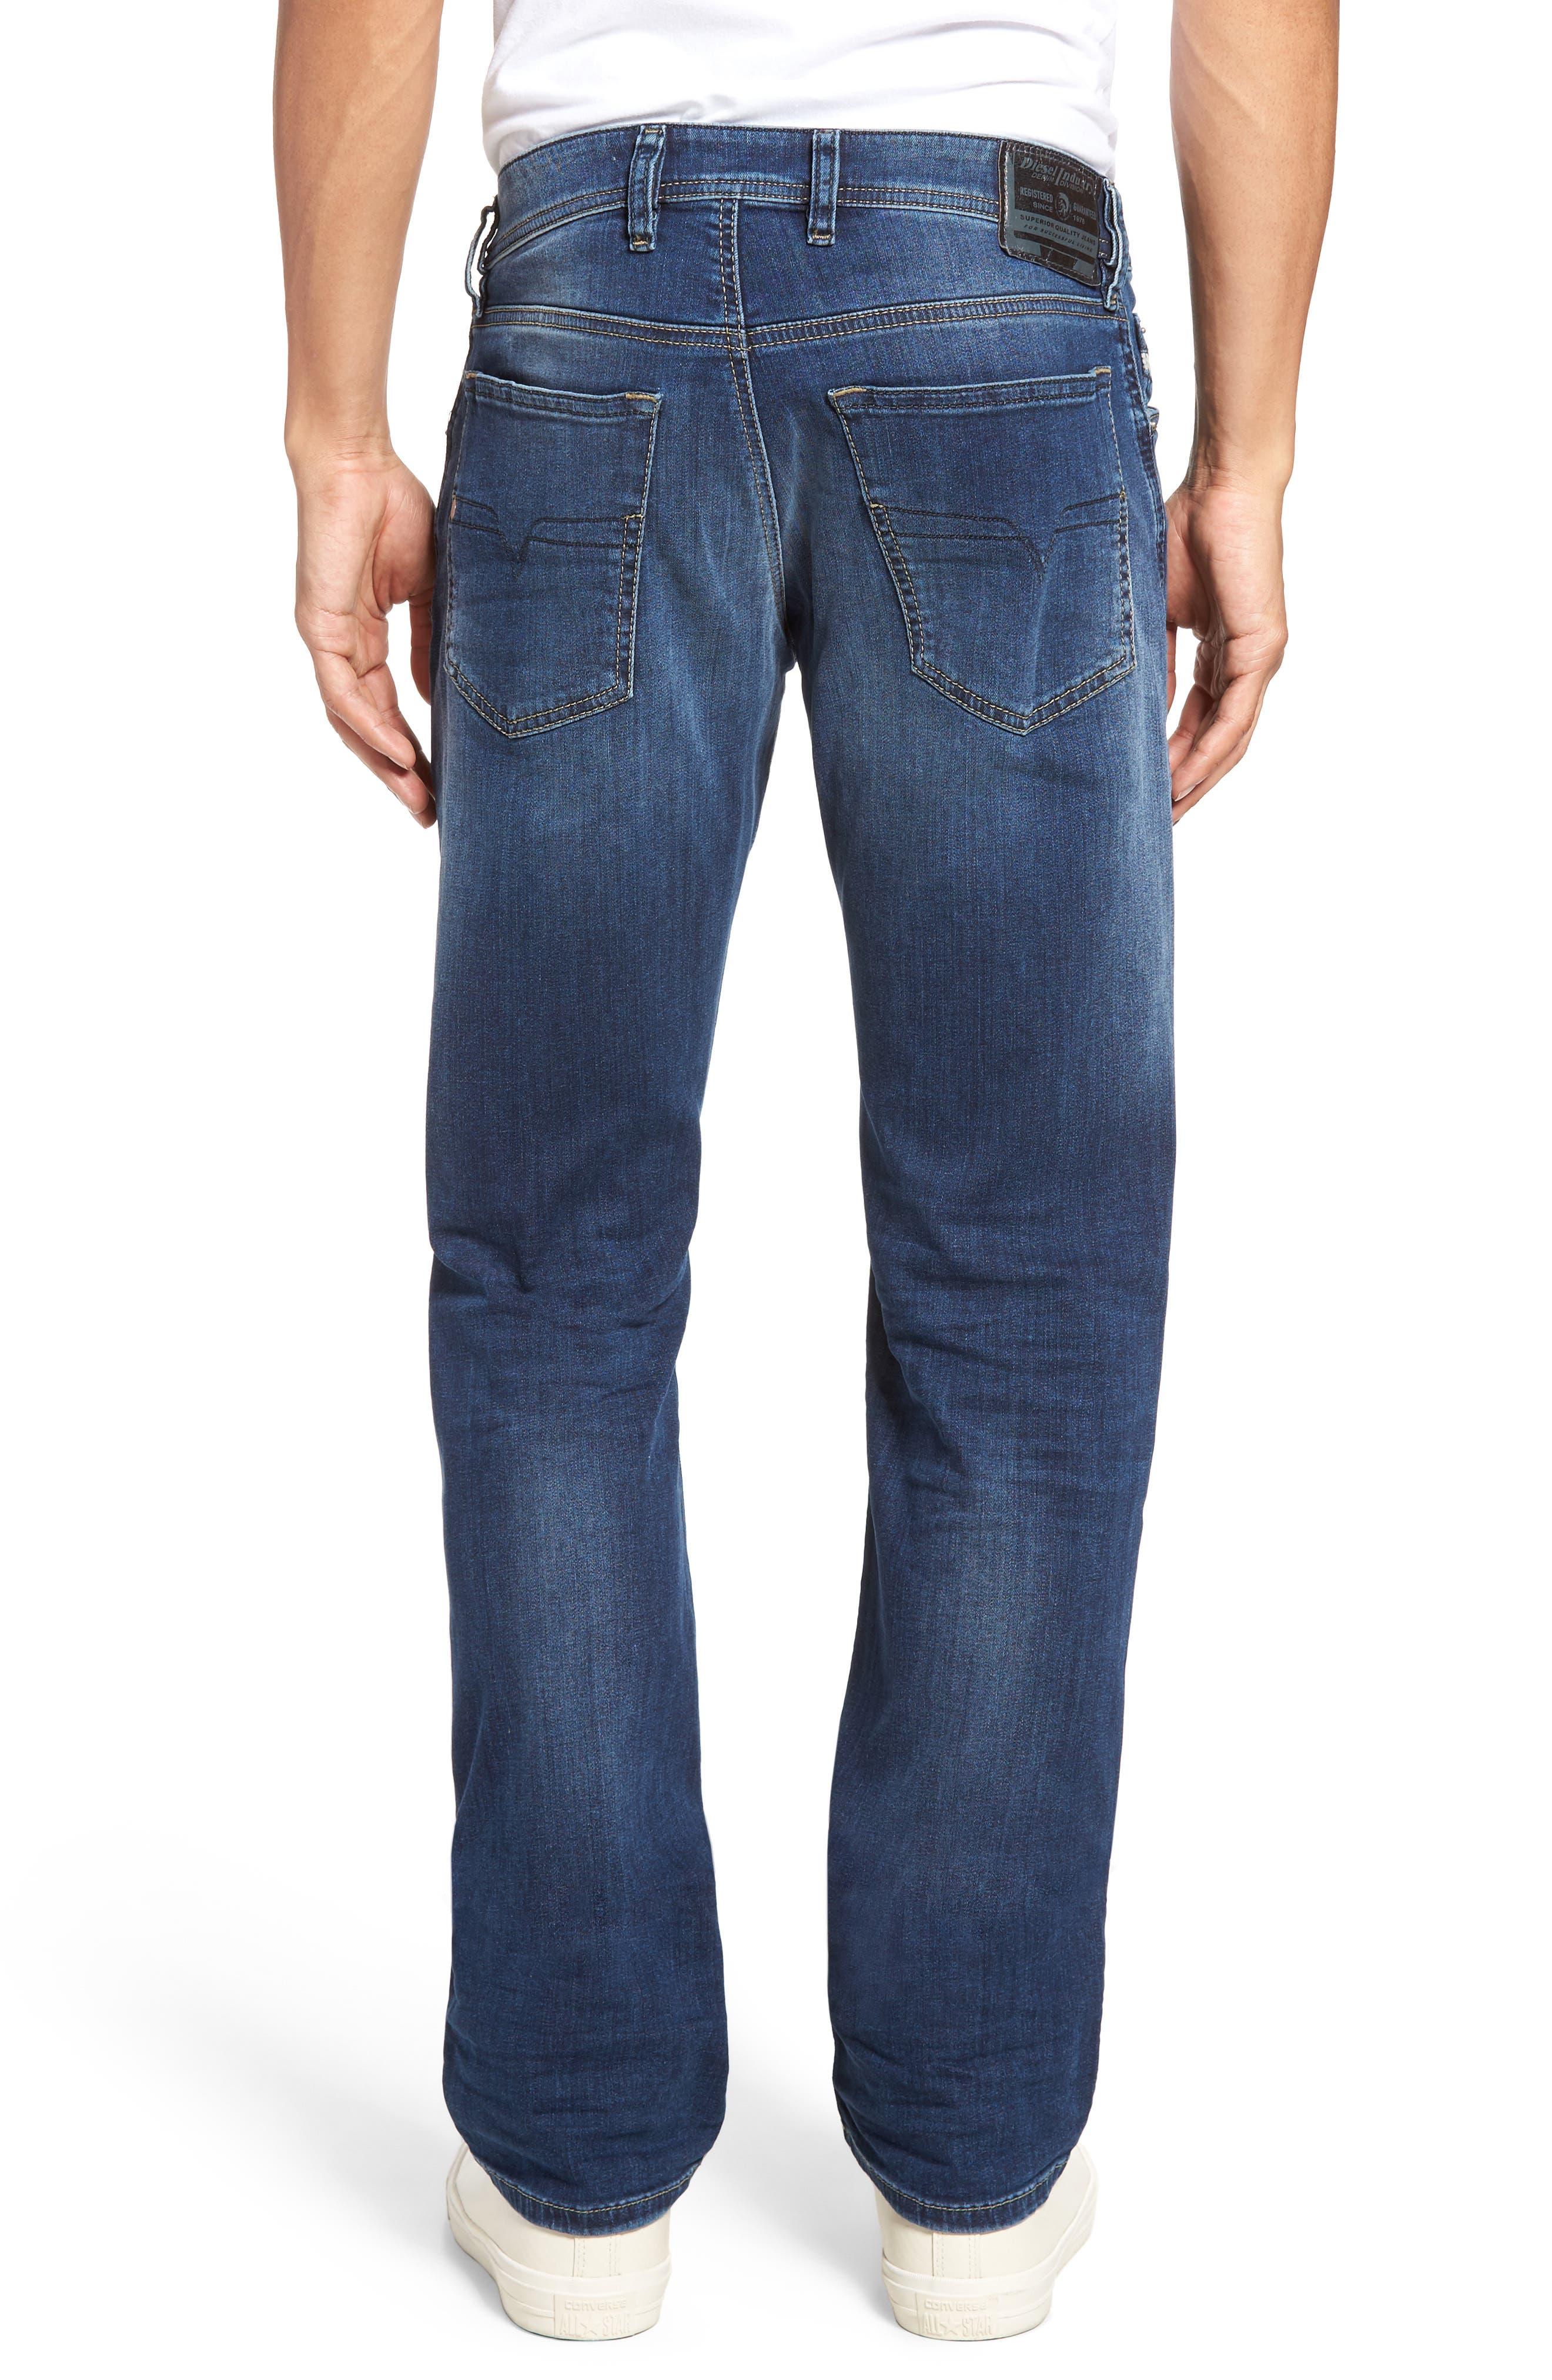 Waykee Straight Leg Jeans,                             Alternate thumbnail 2, color,                             0679I